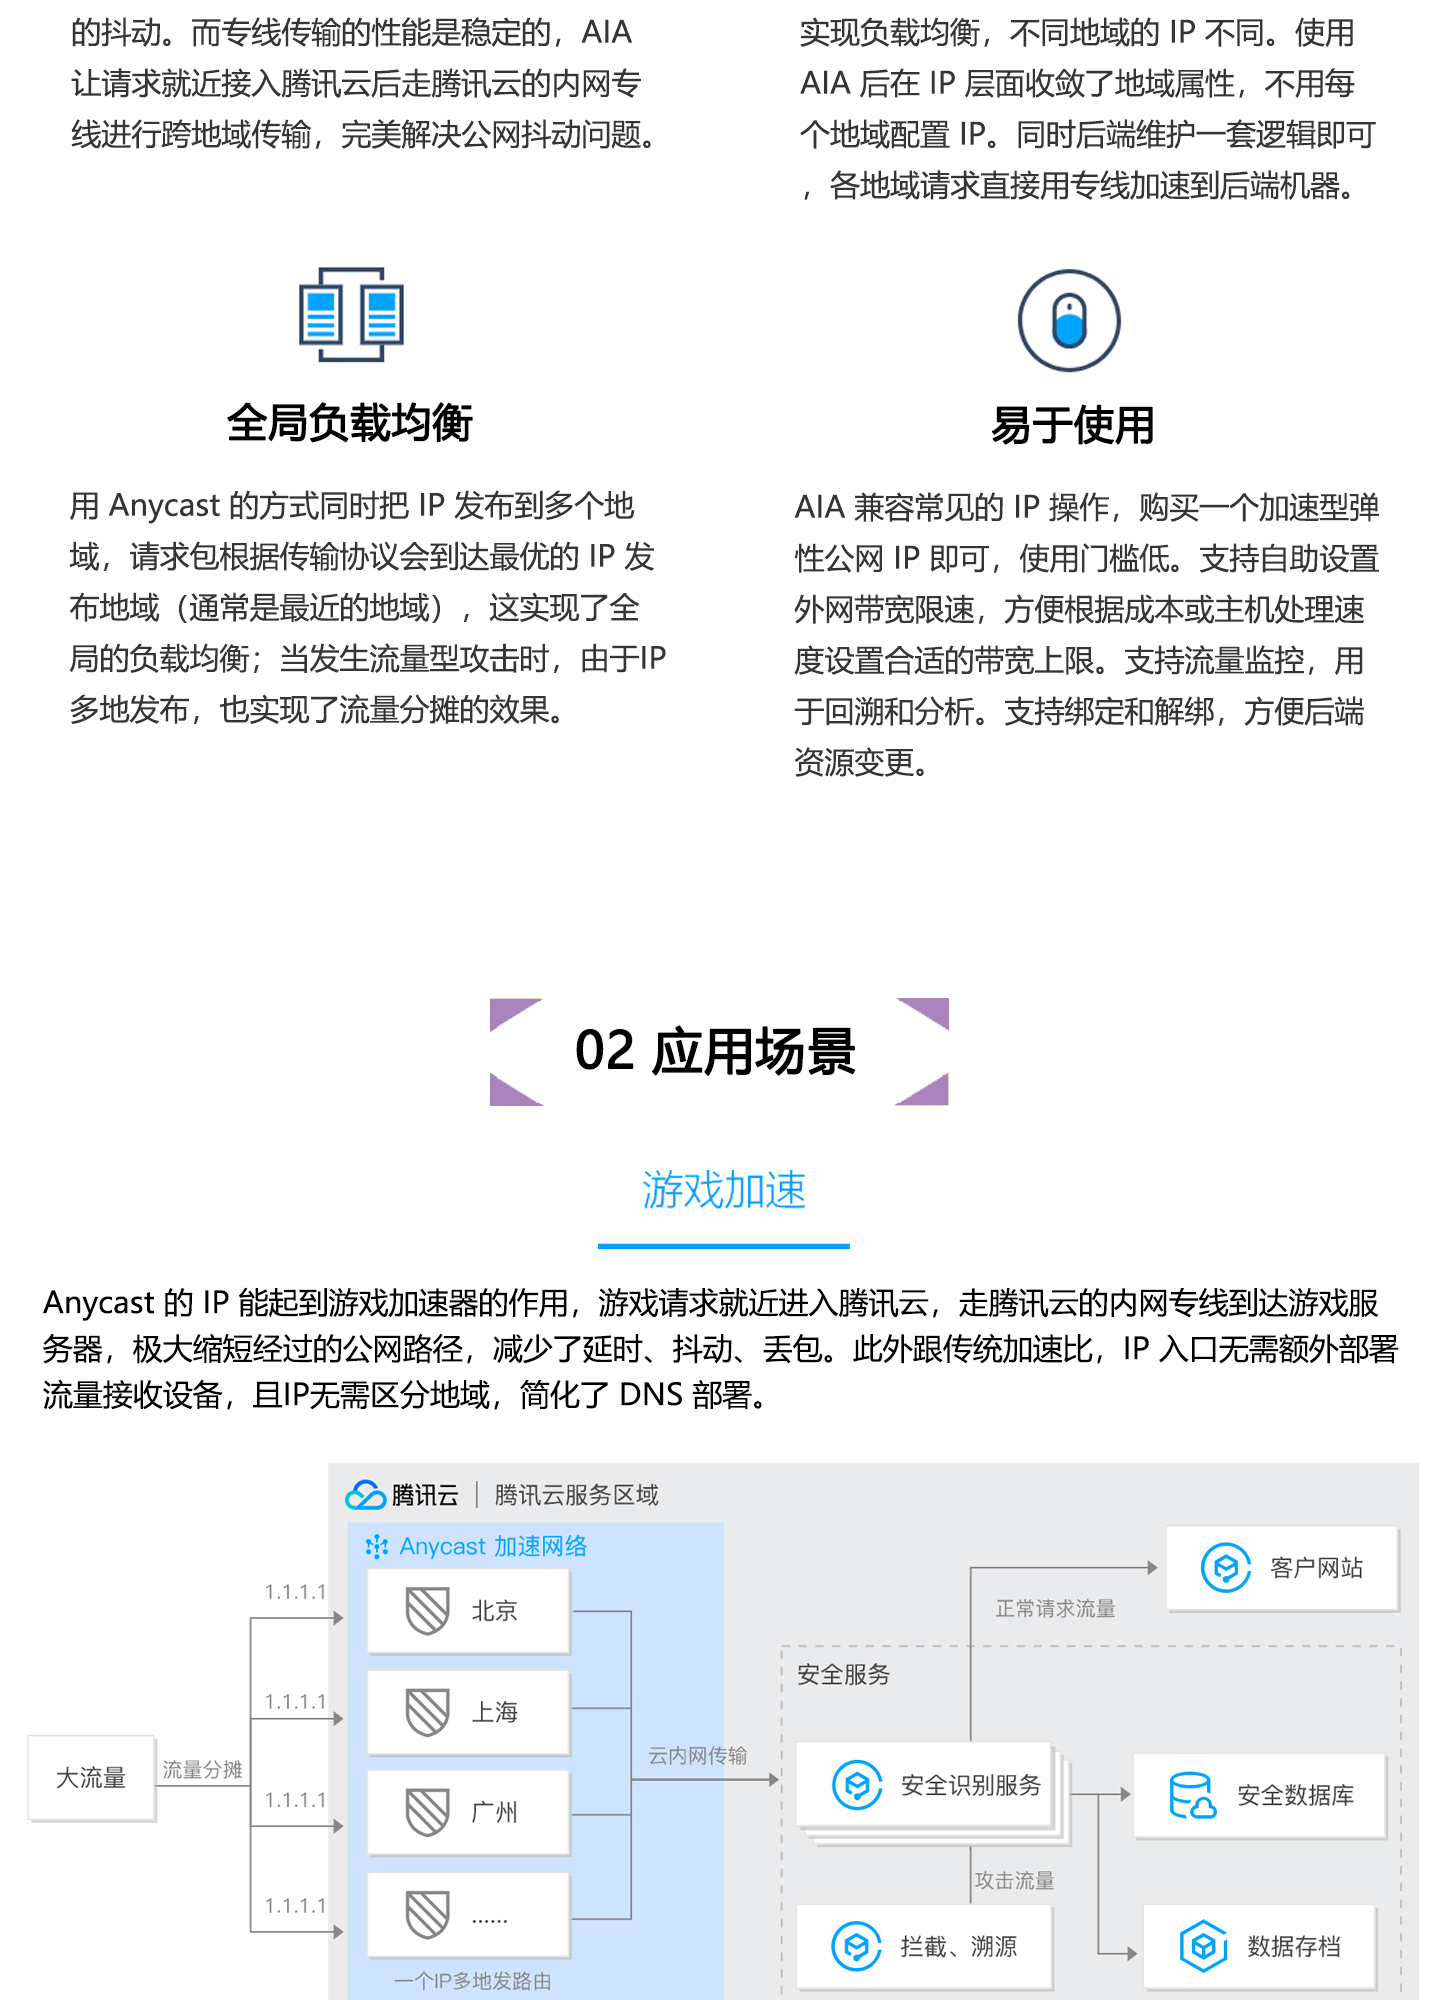 Anycast-公网加速-AIA1440_02.jpg